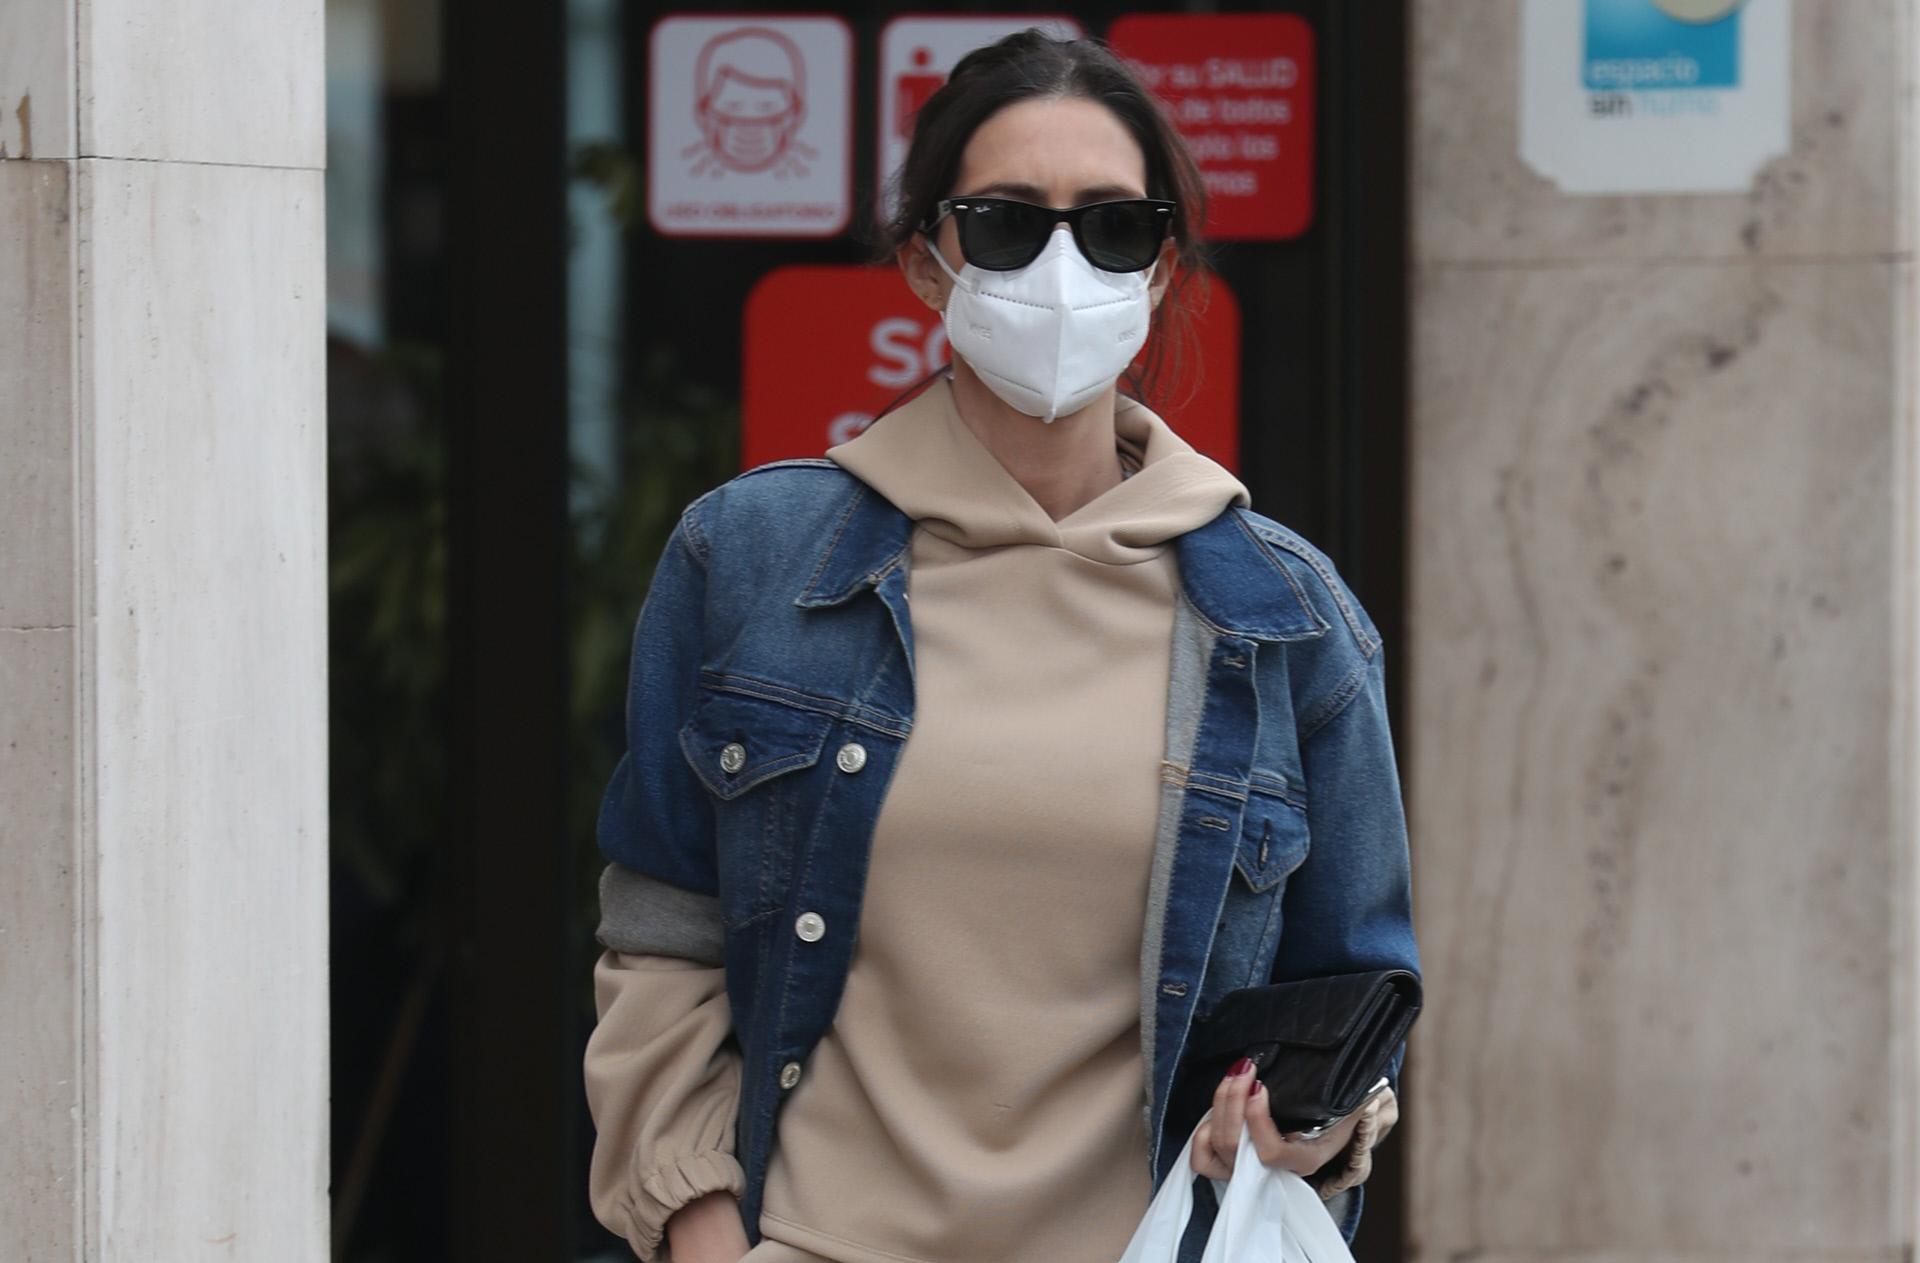 Sara Carbonero de compras por Madrid.